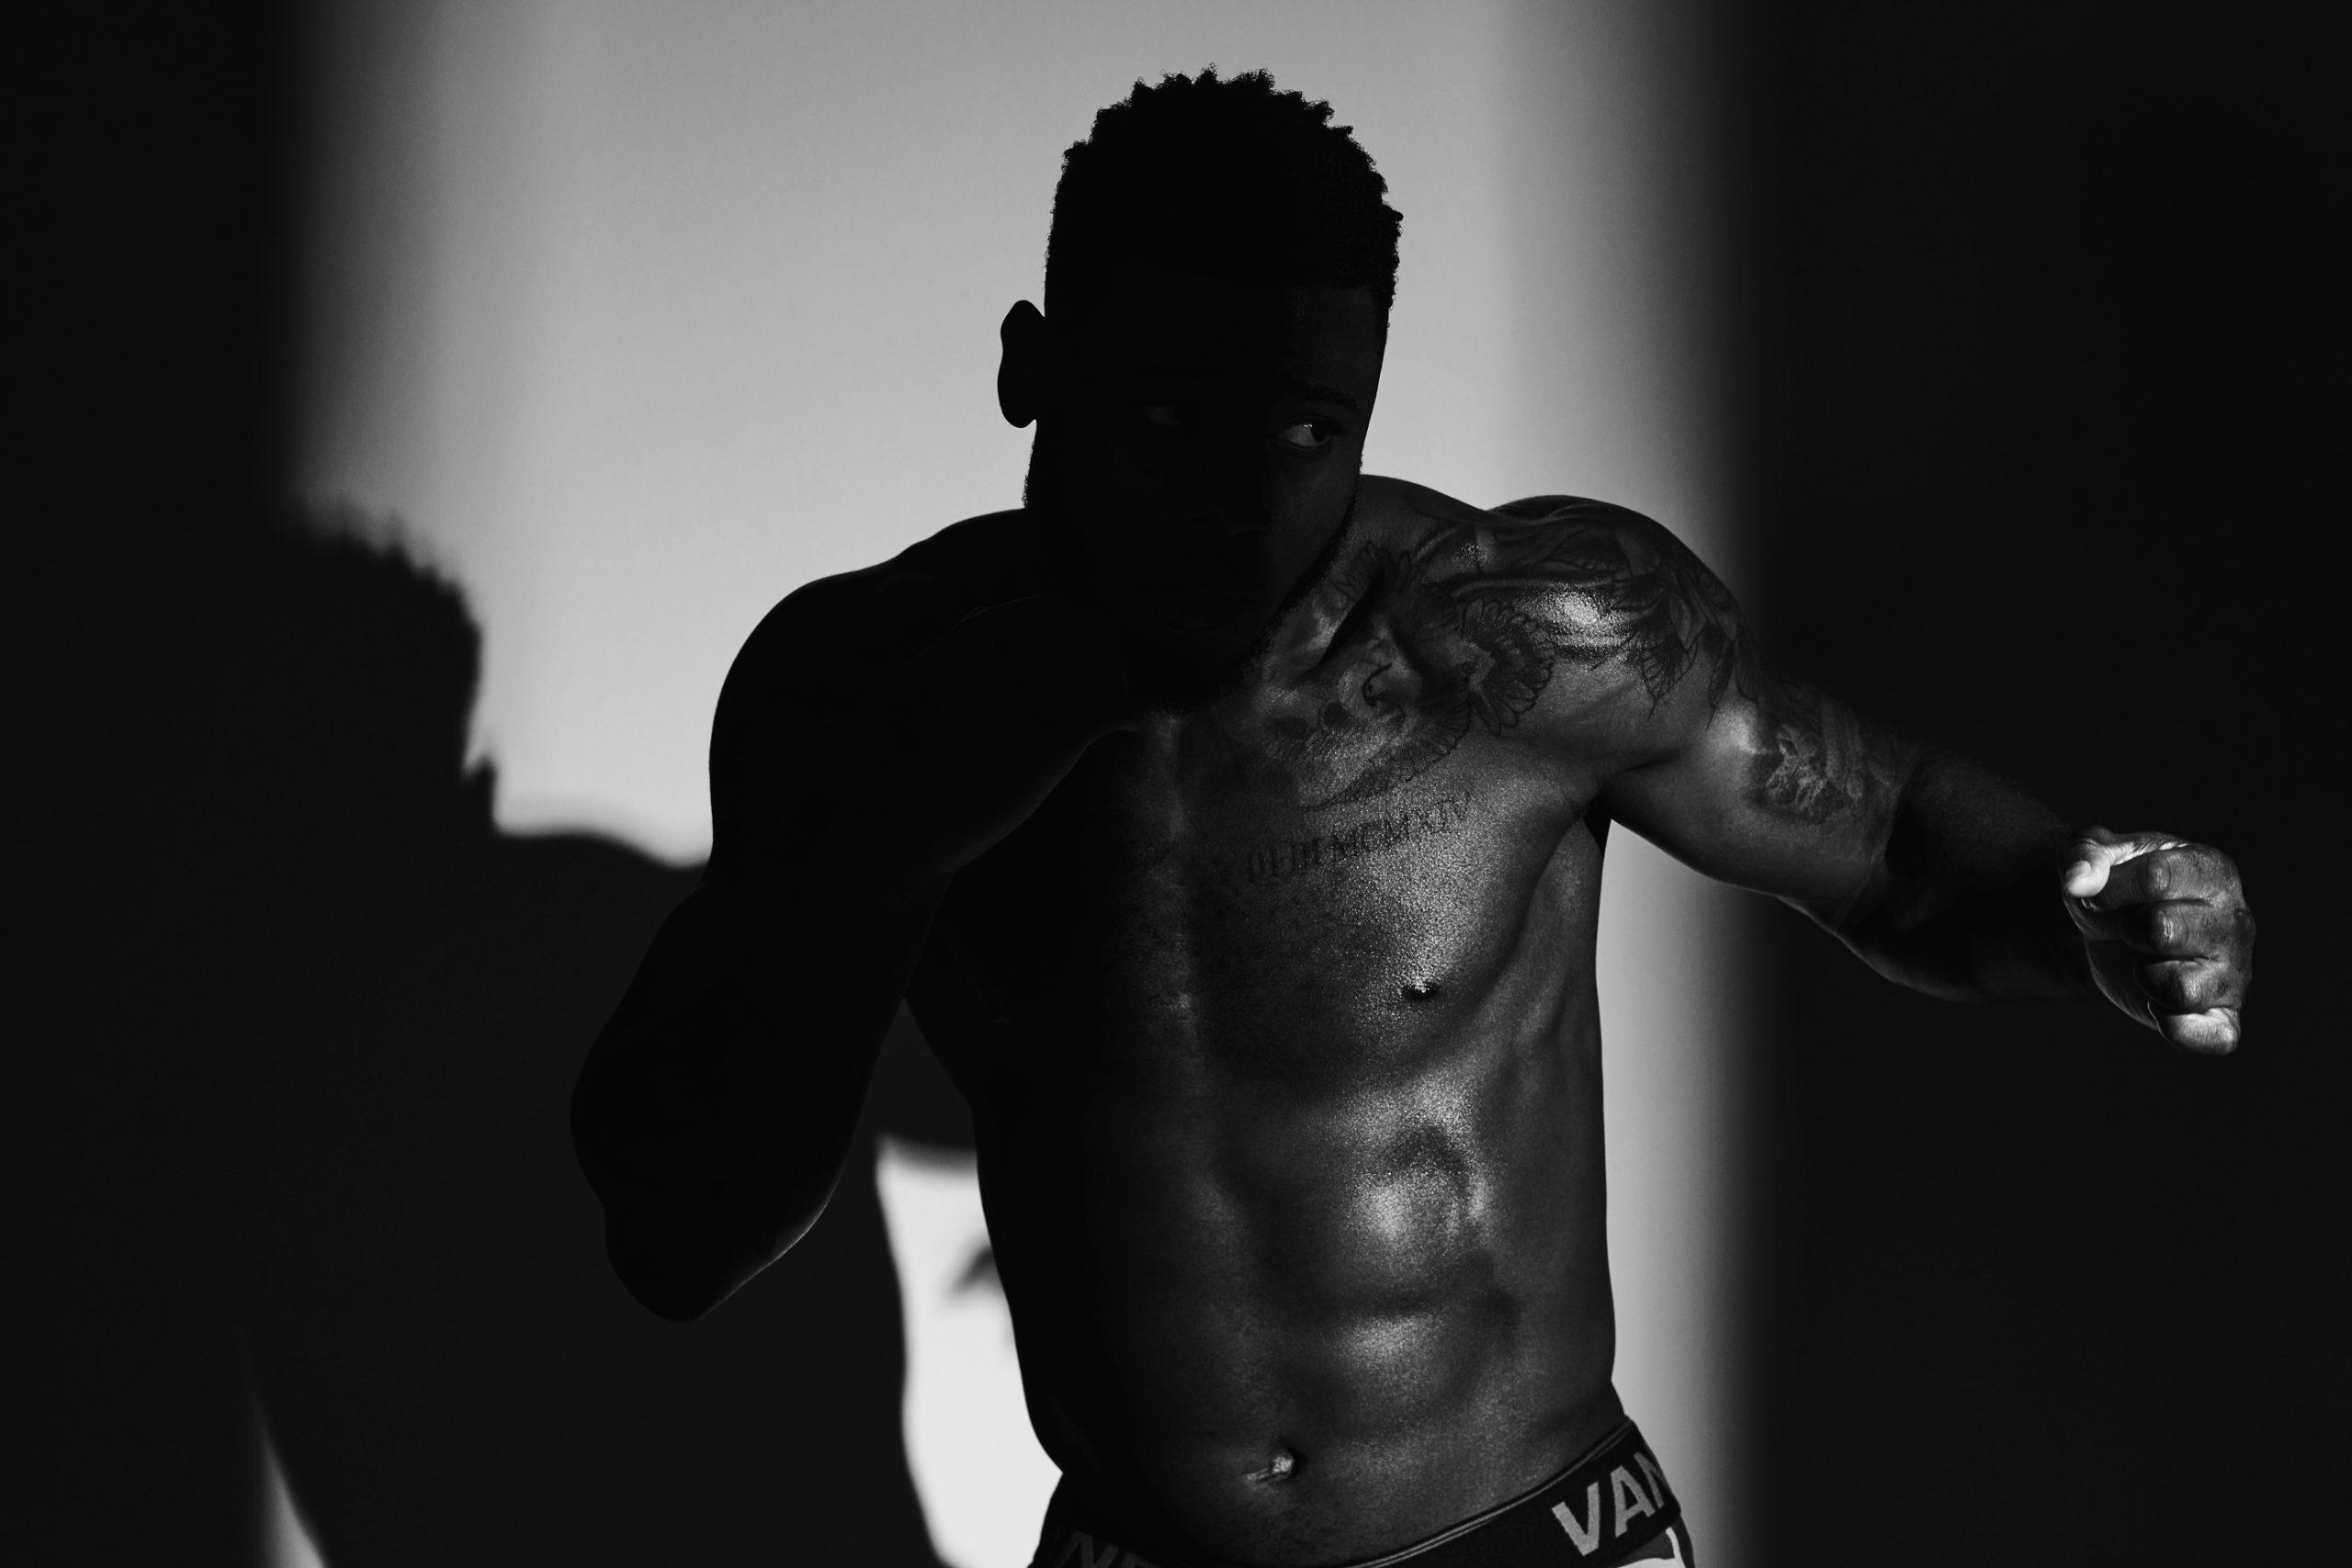 Isaac-Chamberlain-Boxer_shot-01_5092